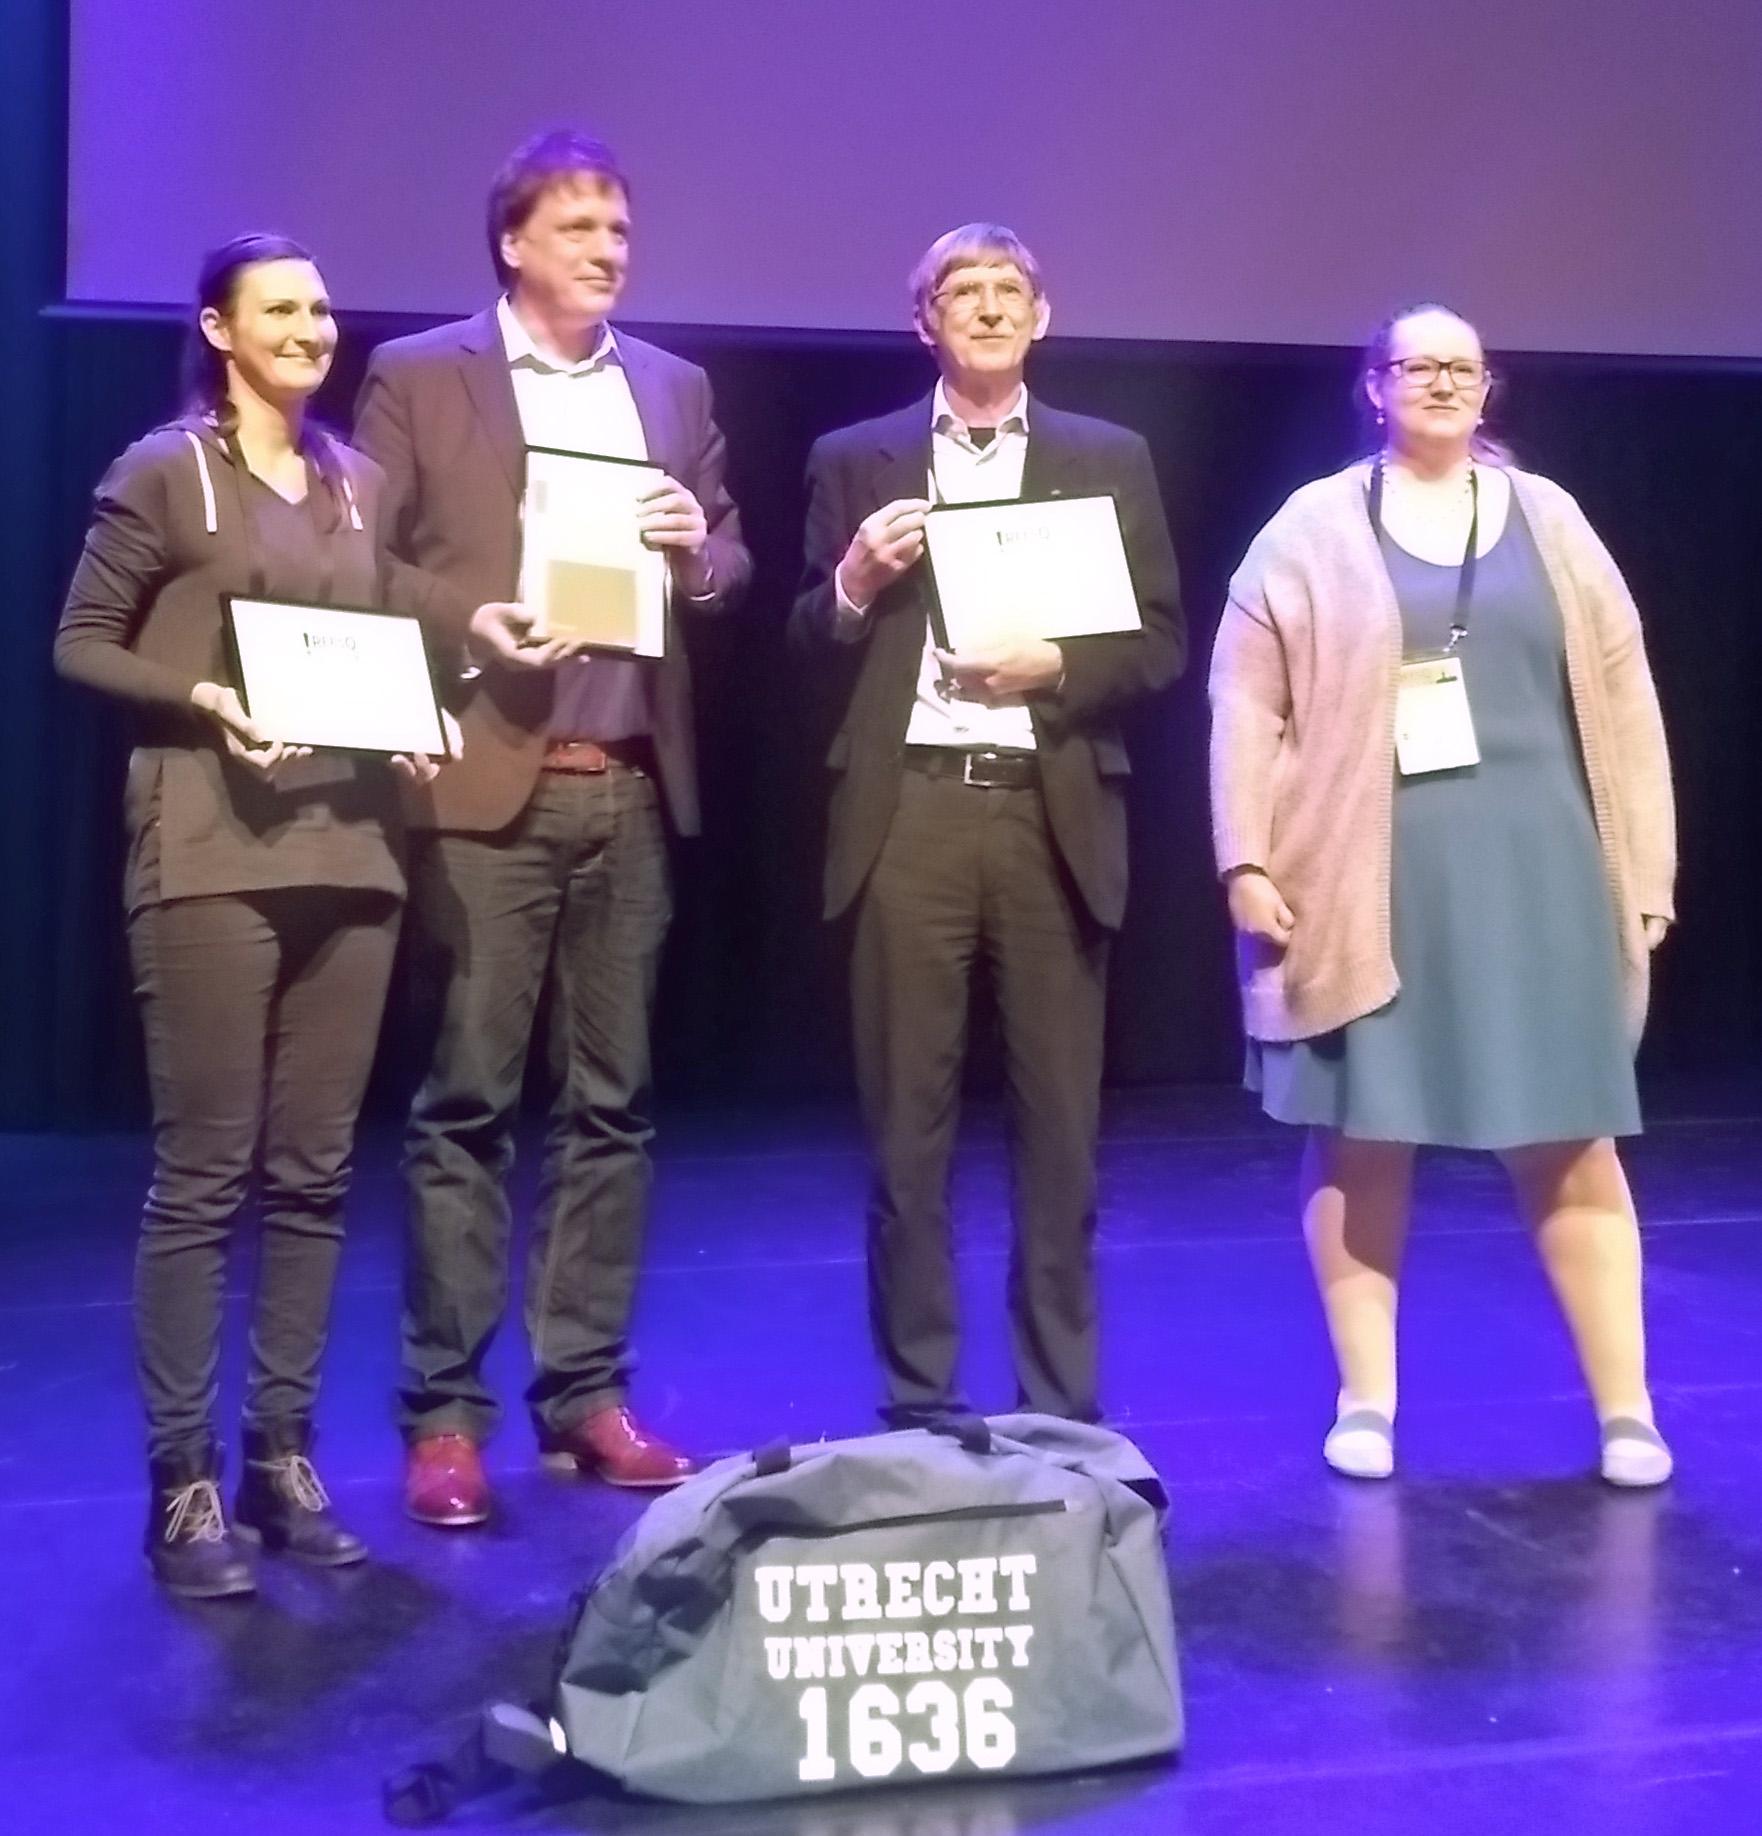 REFSQ 2018 Award